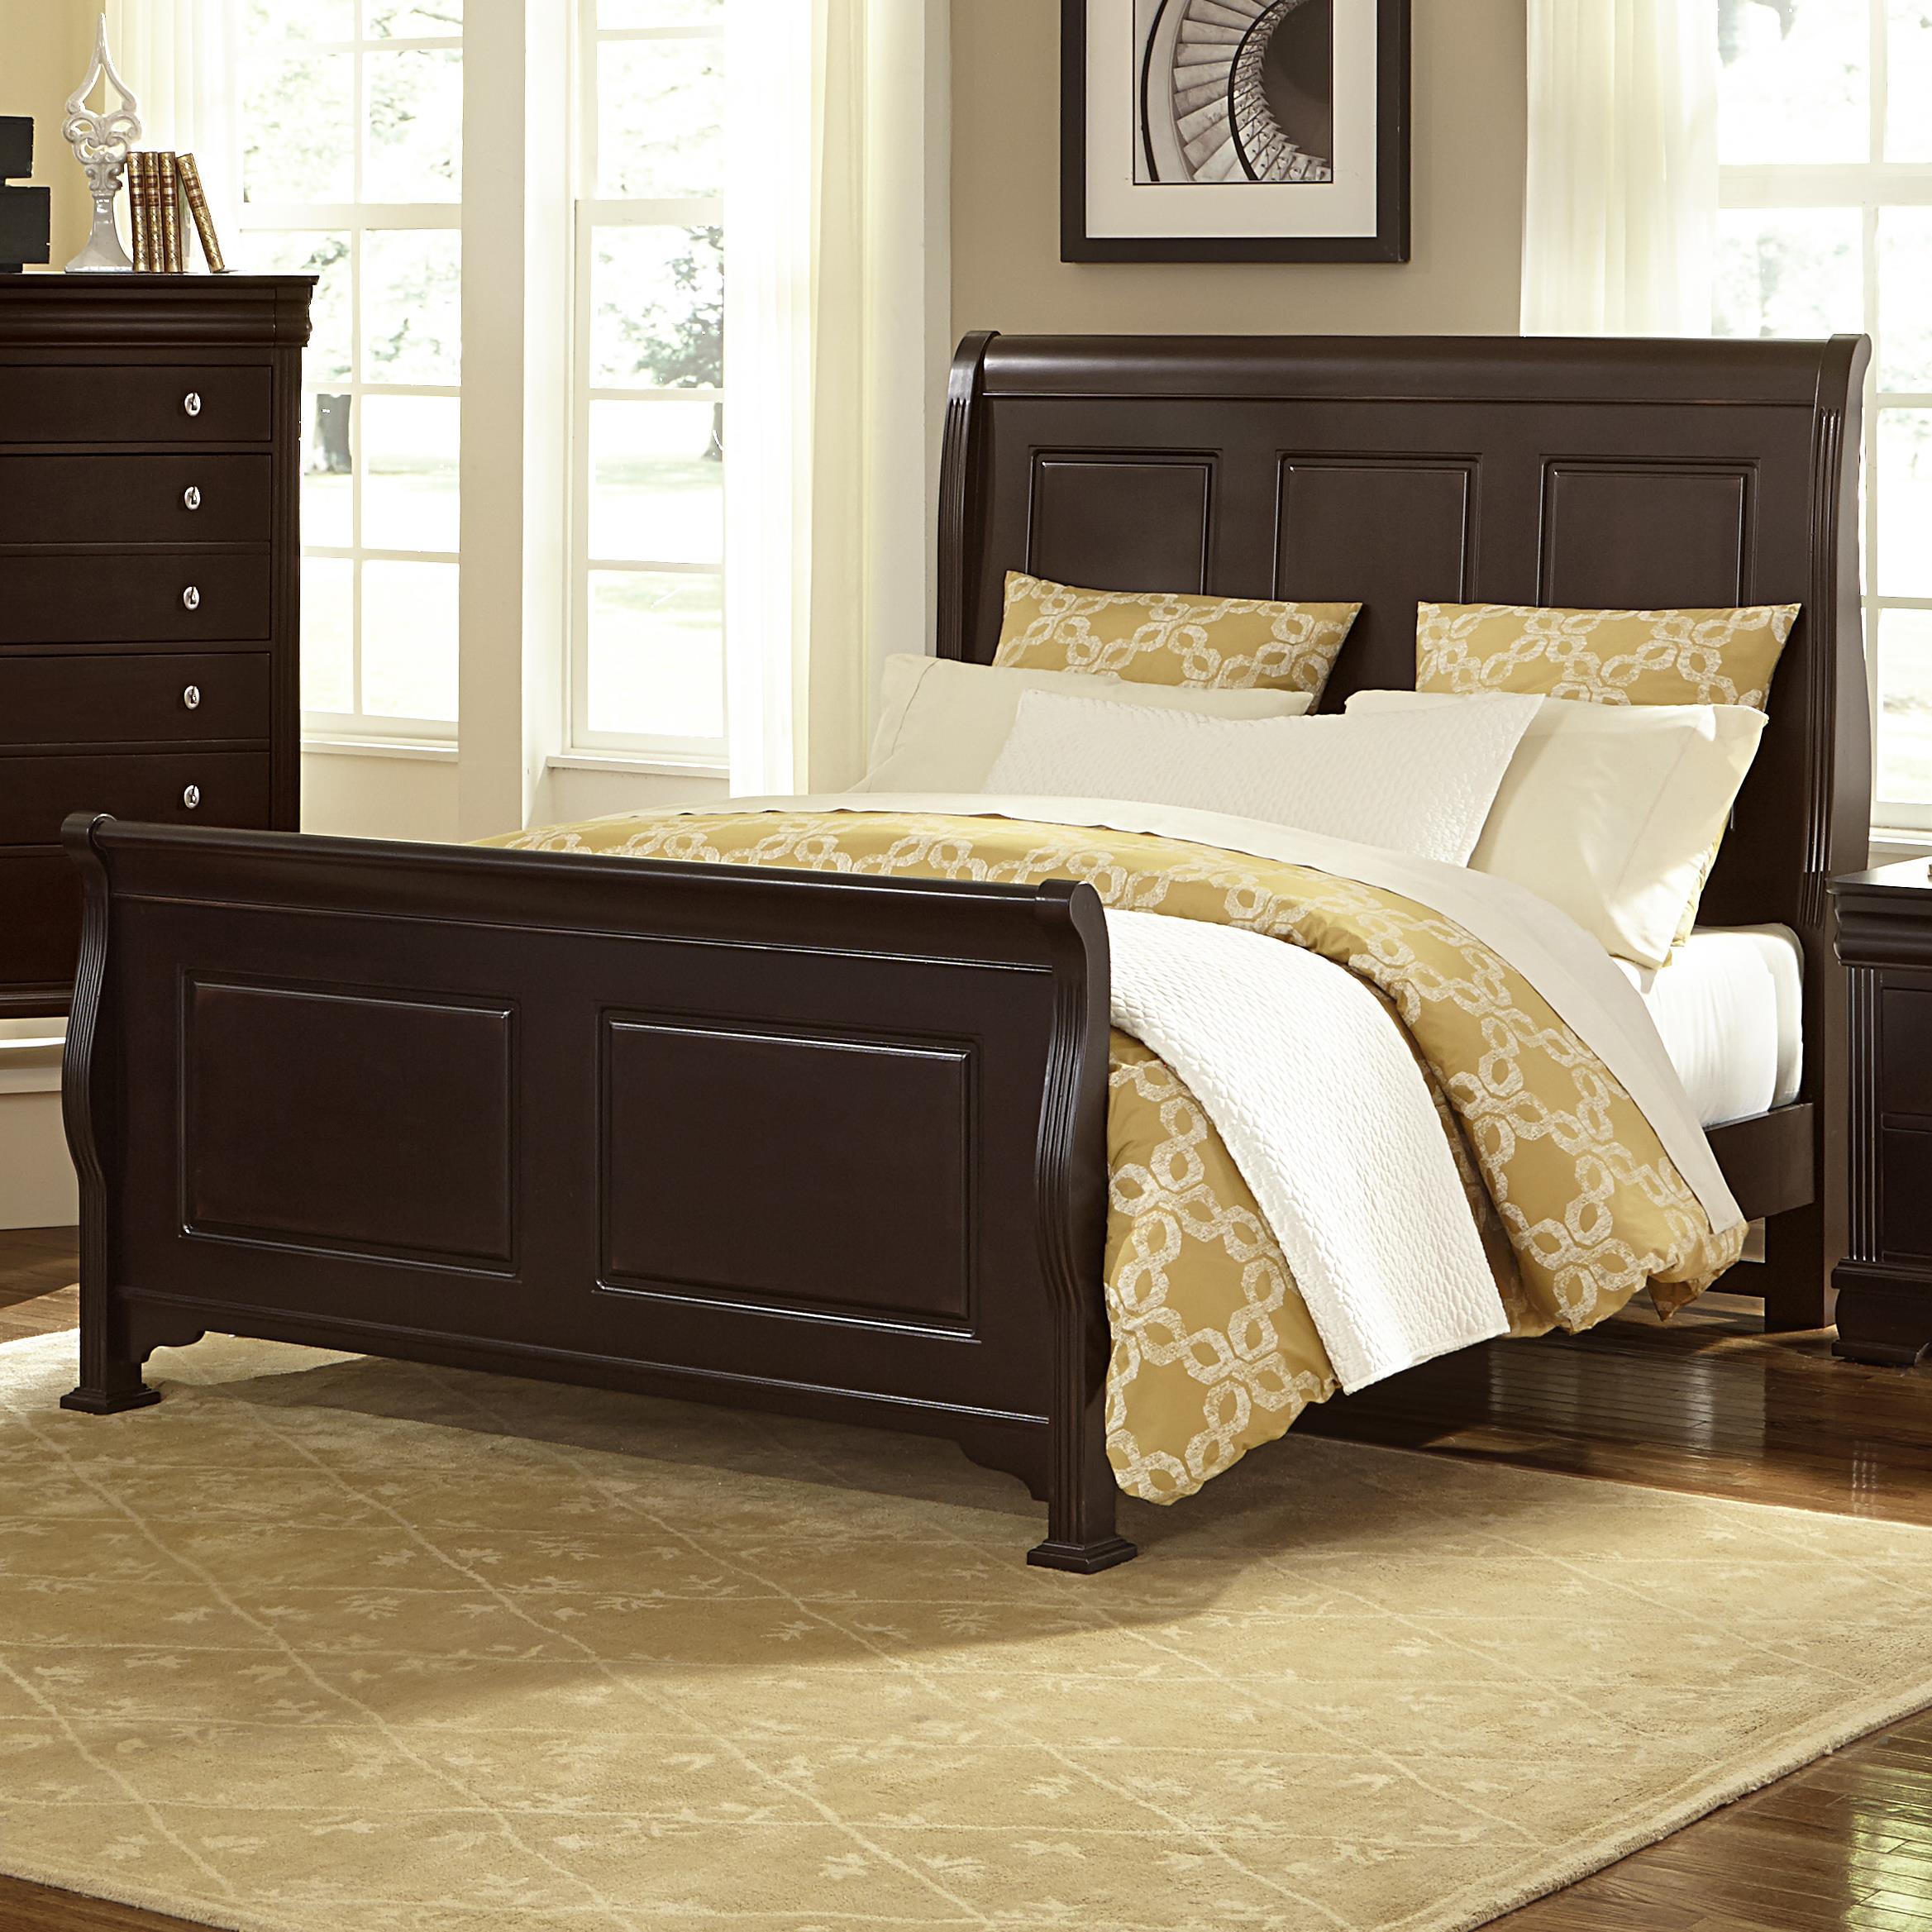 Vaughan Bassett French Market Transitional King Sleigh Bed Belfort Furniture Sleigh Beds